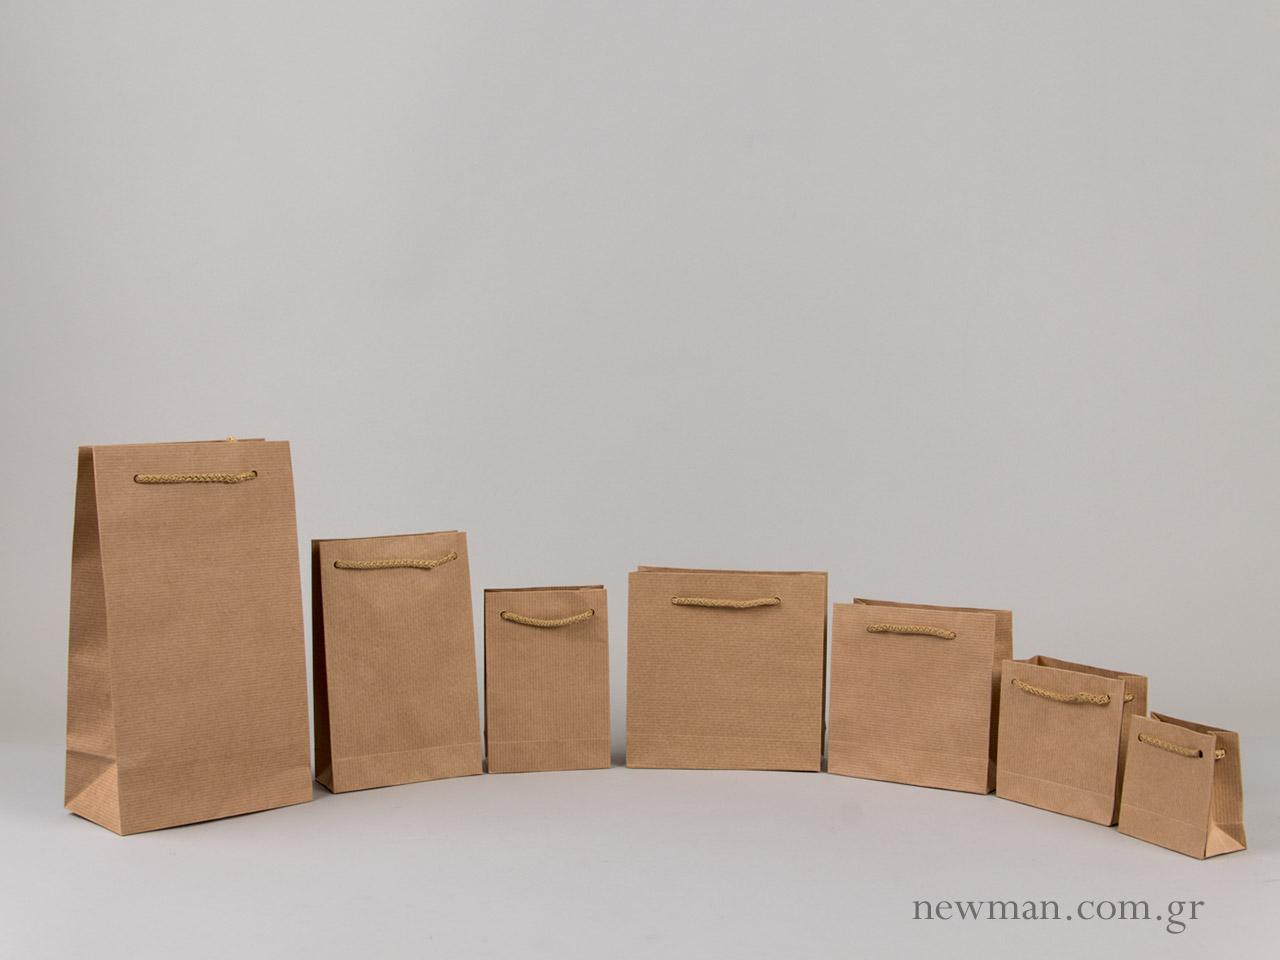 1a6f2c8dc1 Χάρτινες τσάντες kraft με κορδόνι για δώρα και μπιζού – NewMan